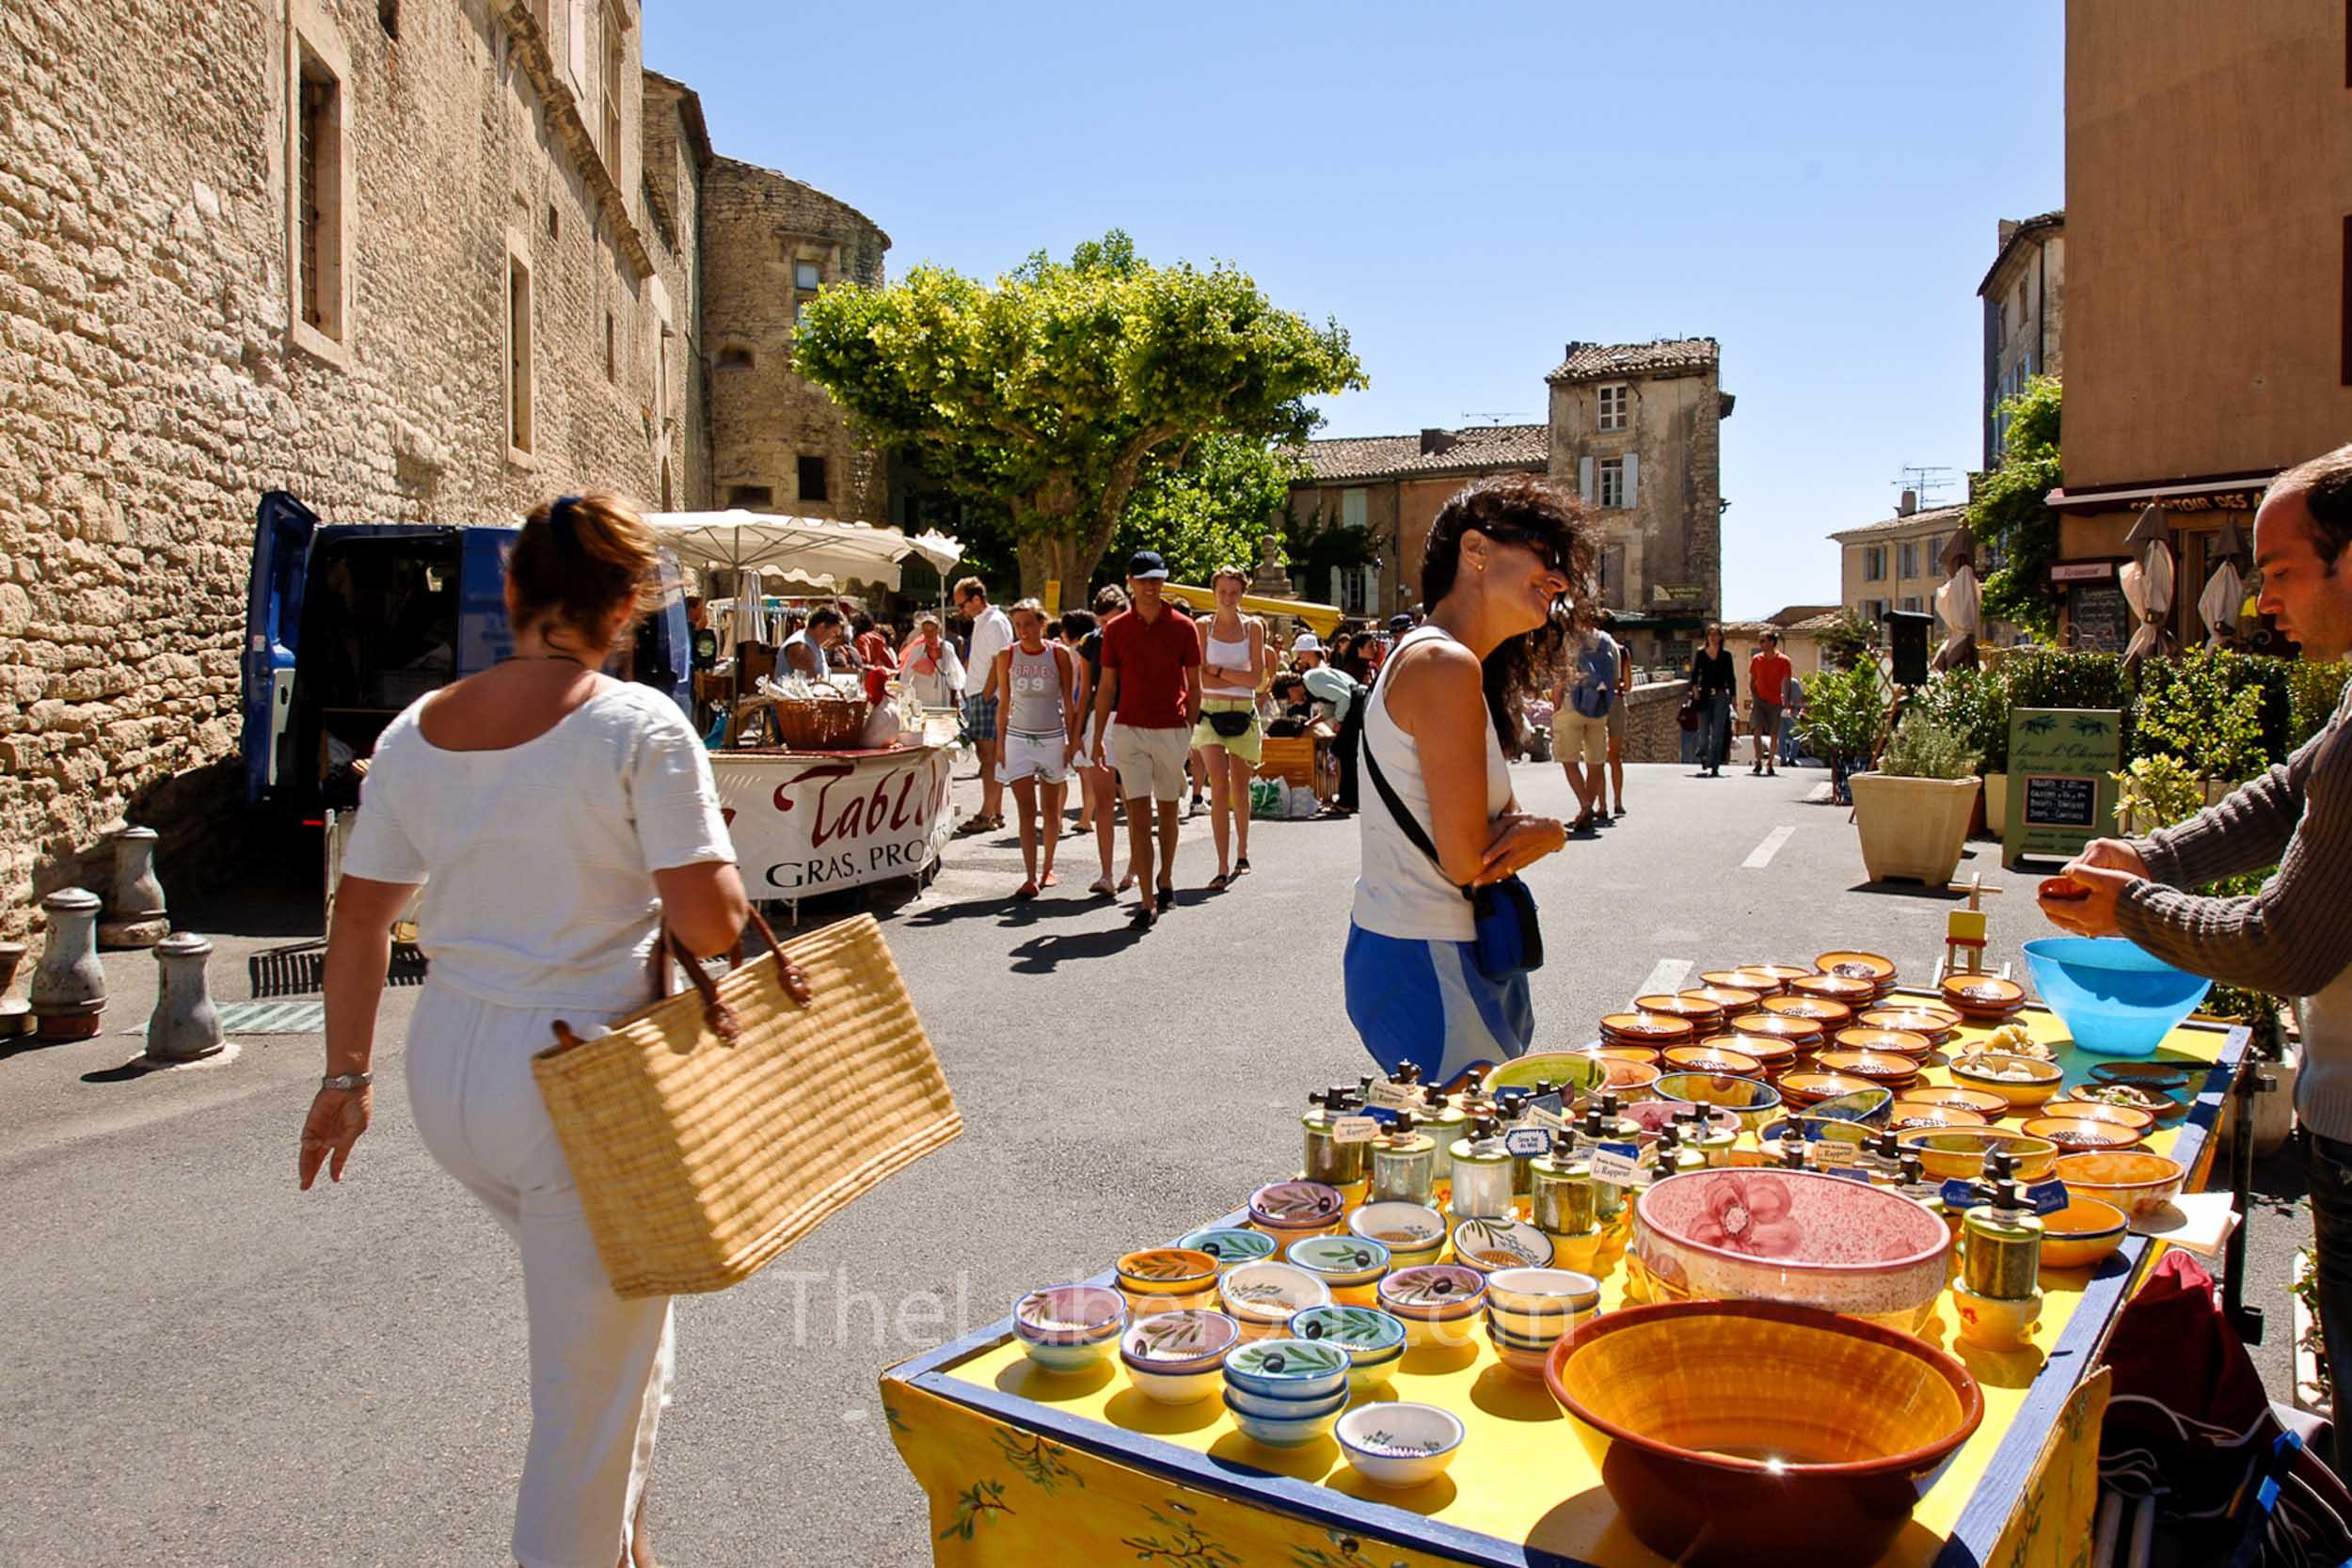 Shoppers at Gordes market